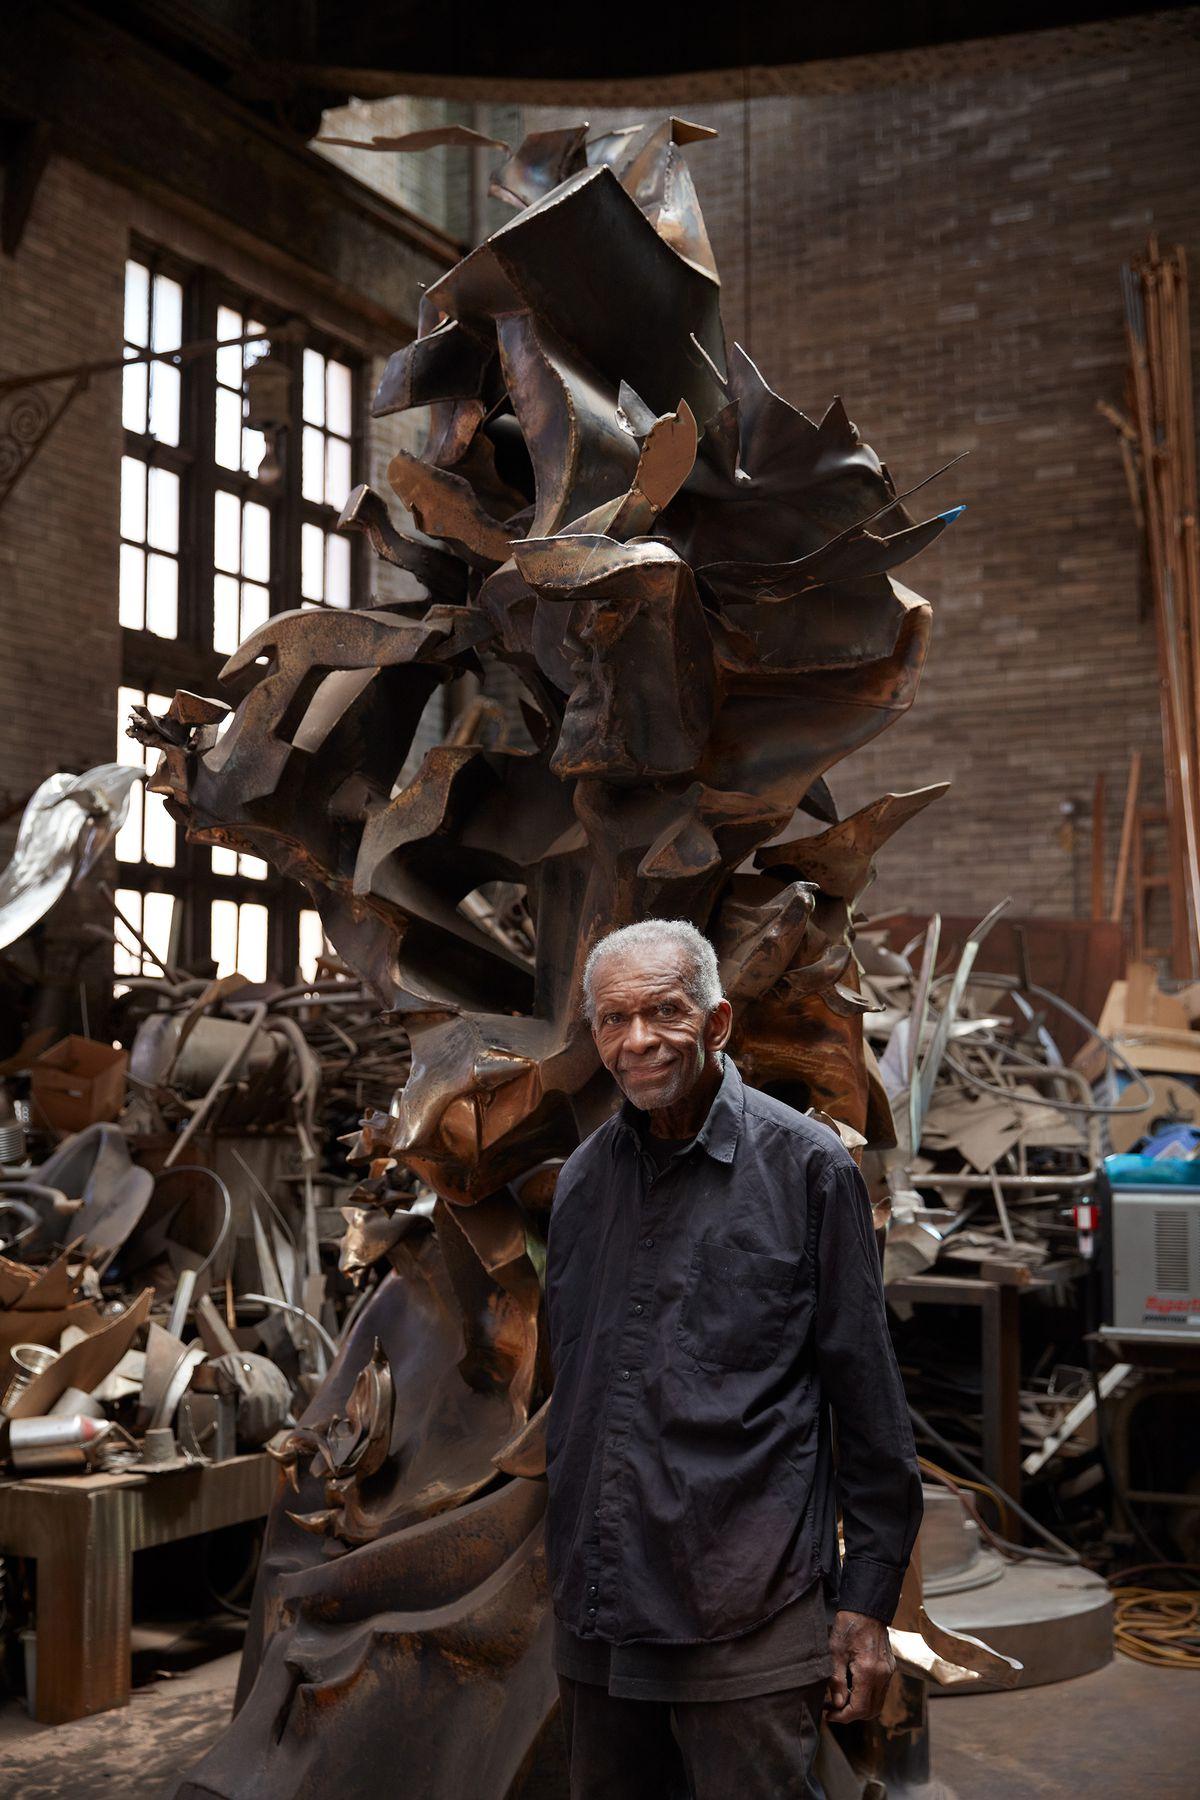 Richard Hunt in his studio with the sculptureScholar's Rock or Stone of Hope or Love of Bronze (2014–2020).